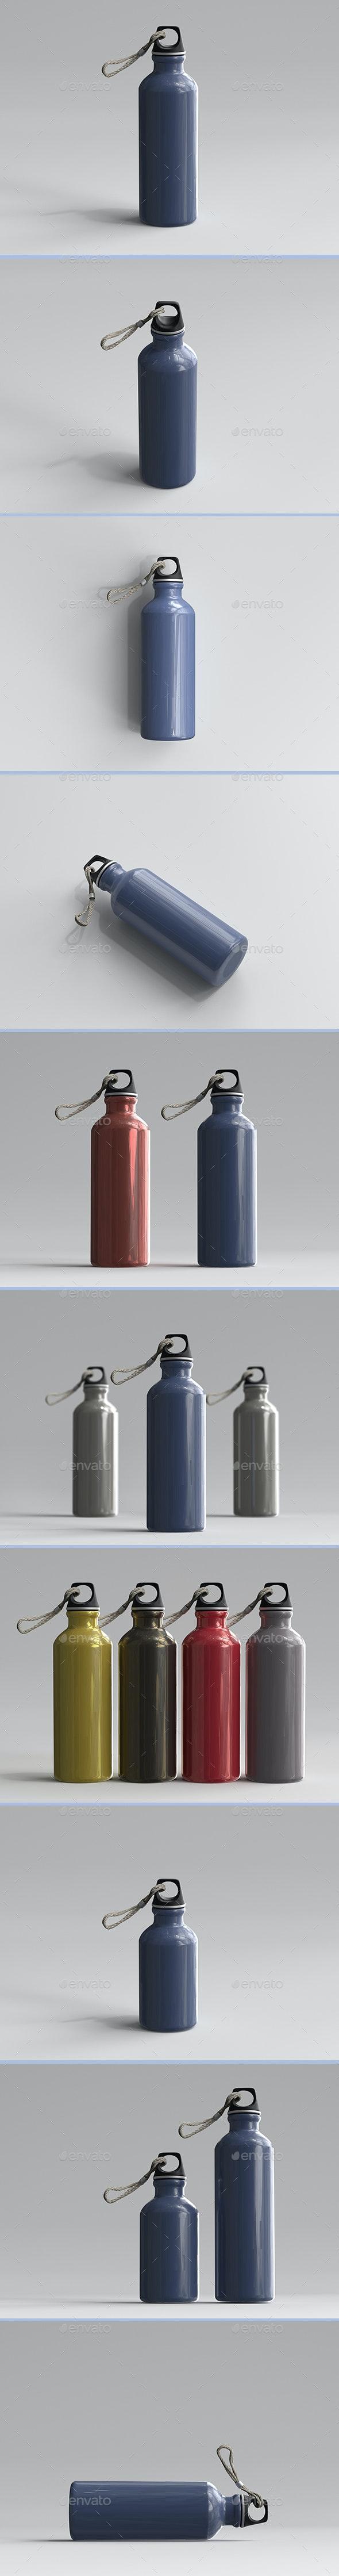 3D Rendered Aluminum Water Bottles - Objects 3D Renders